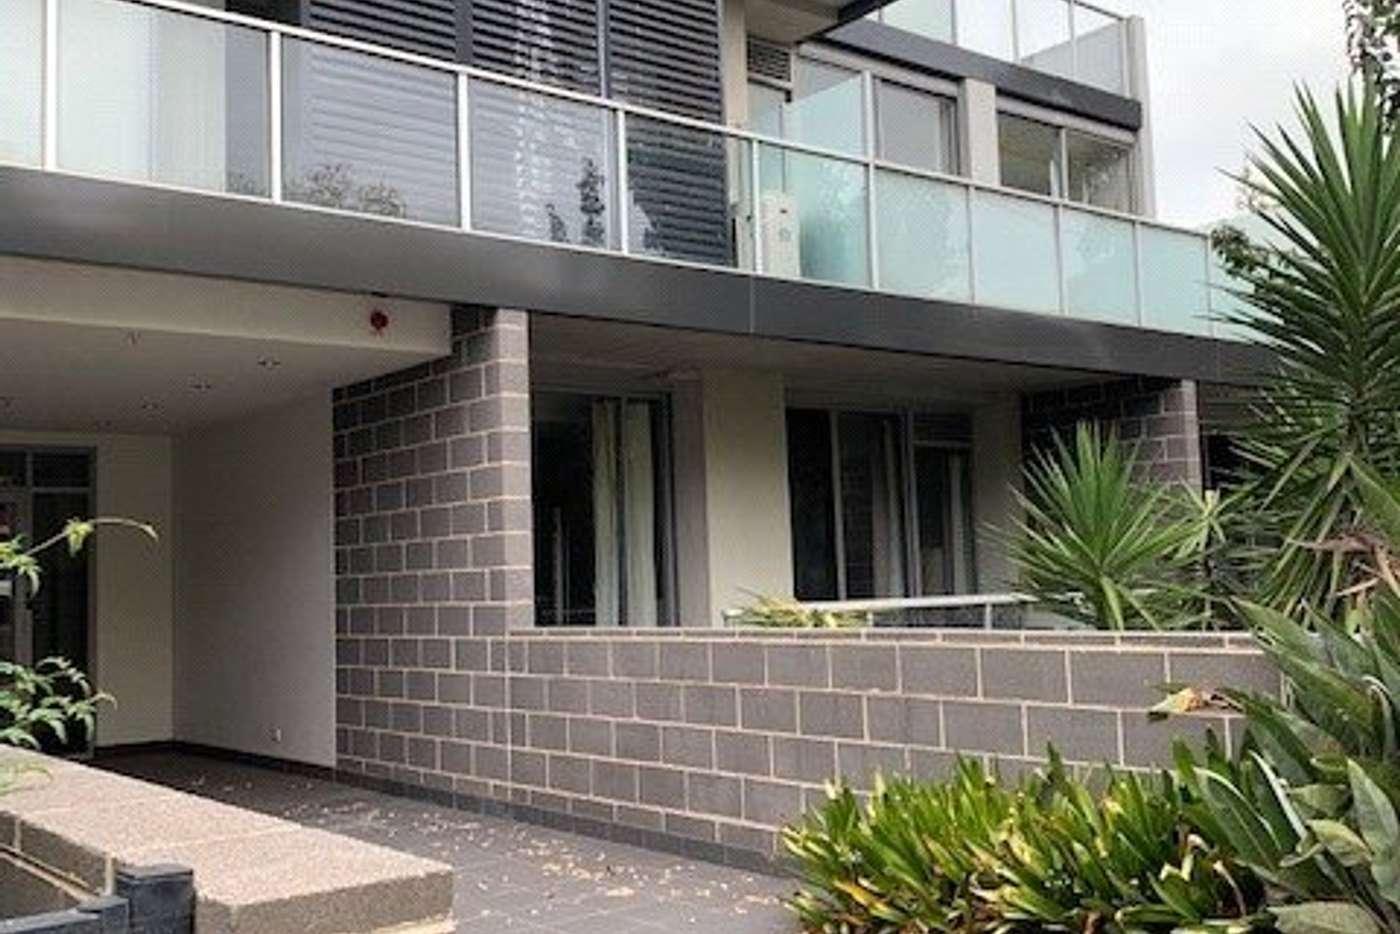 Main view of Homely apartment listing, 5/286 Blackburn Road, Glen Waverley VIC 3150